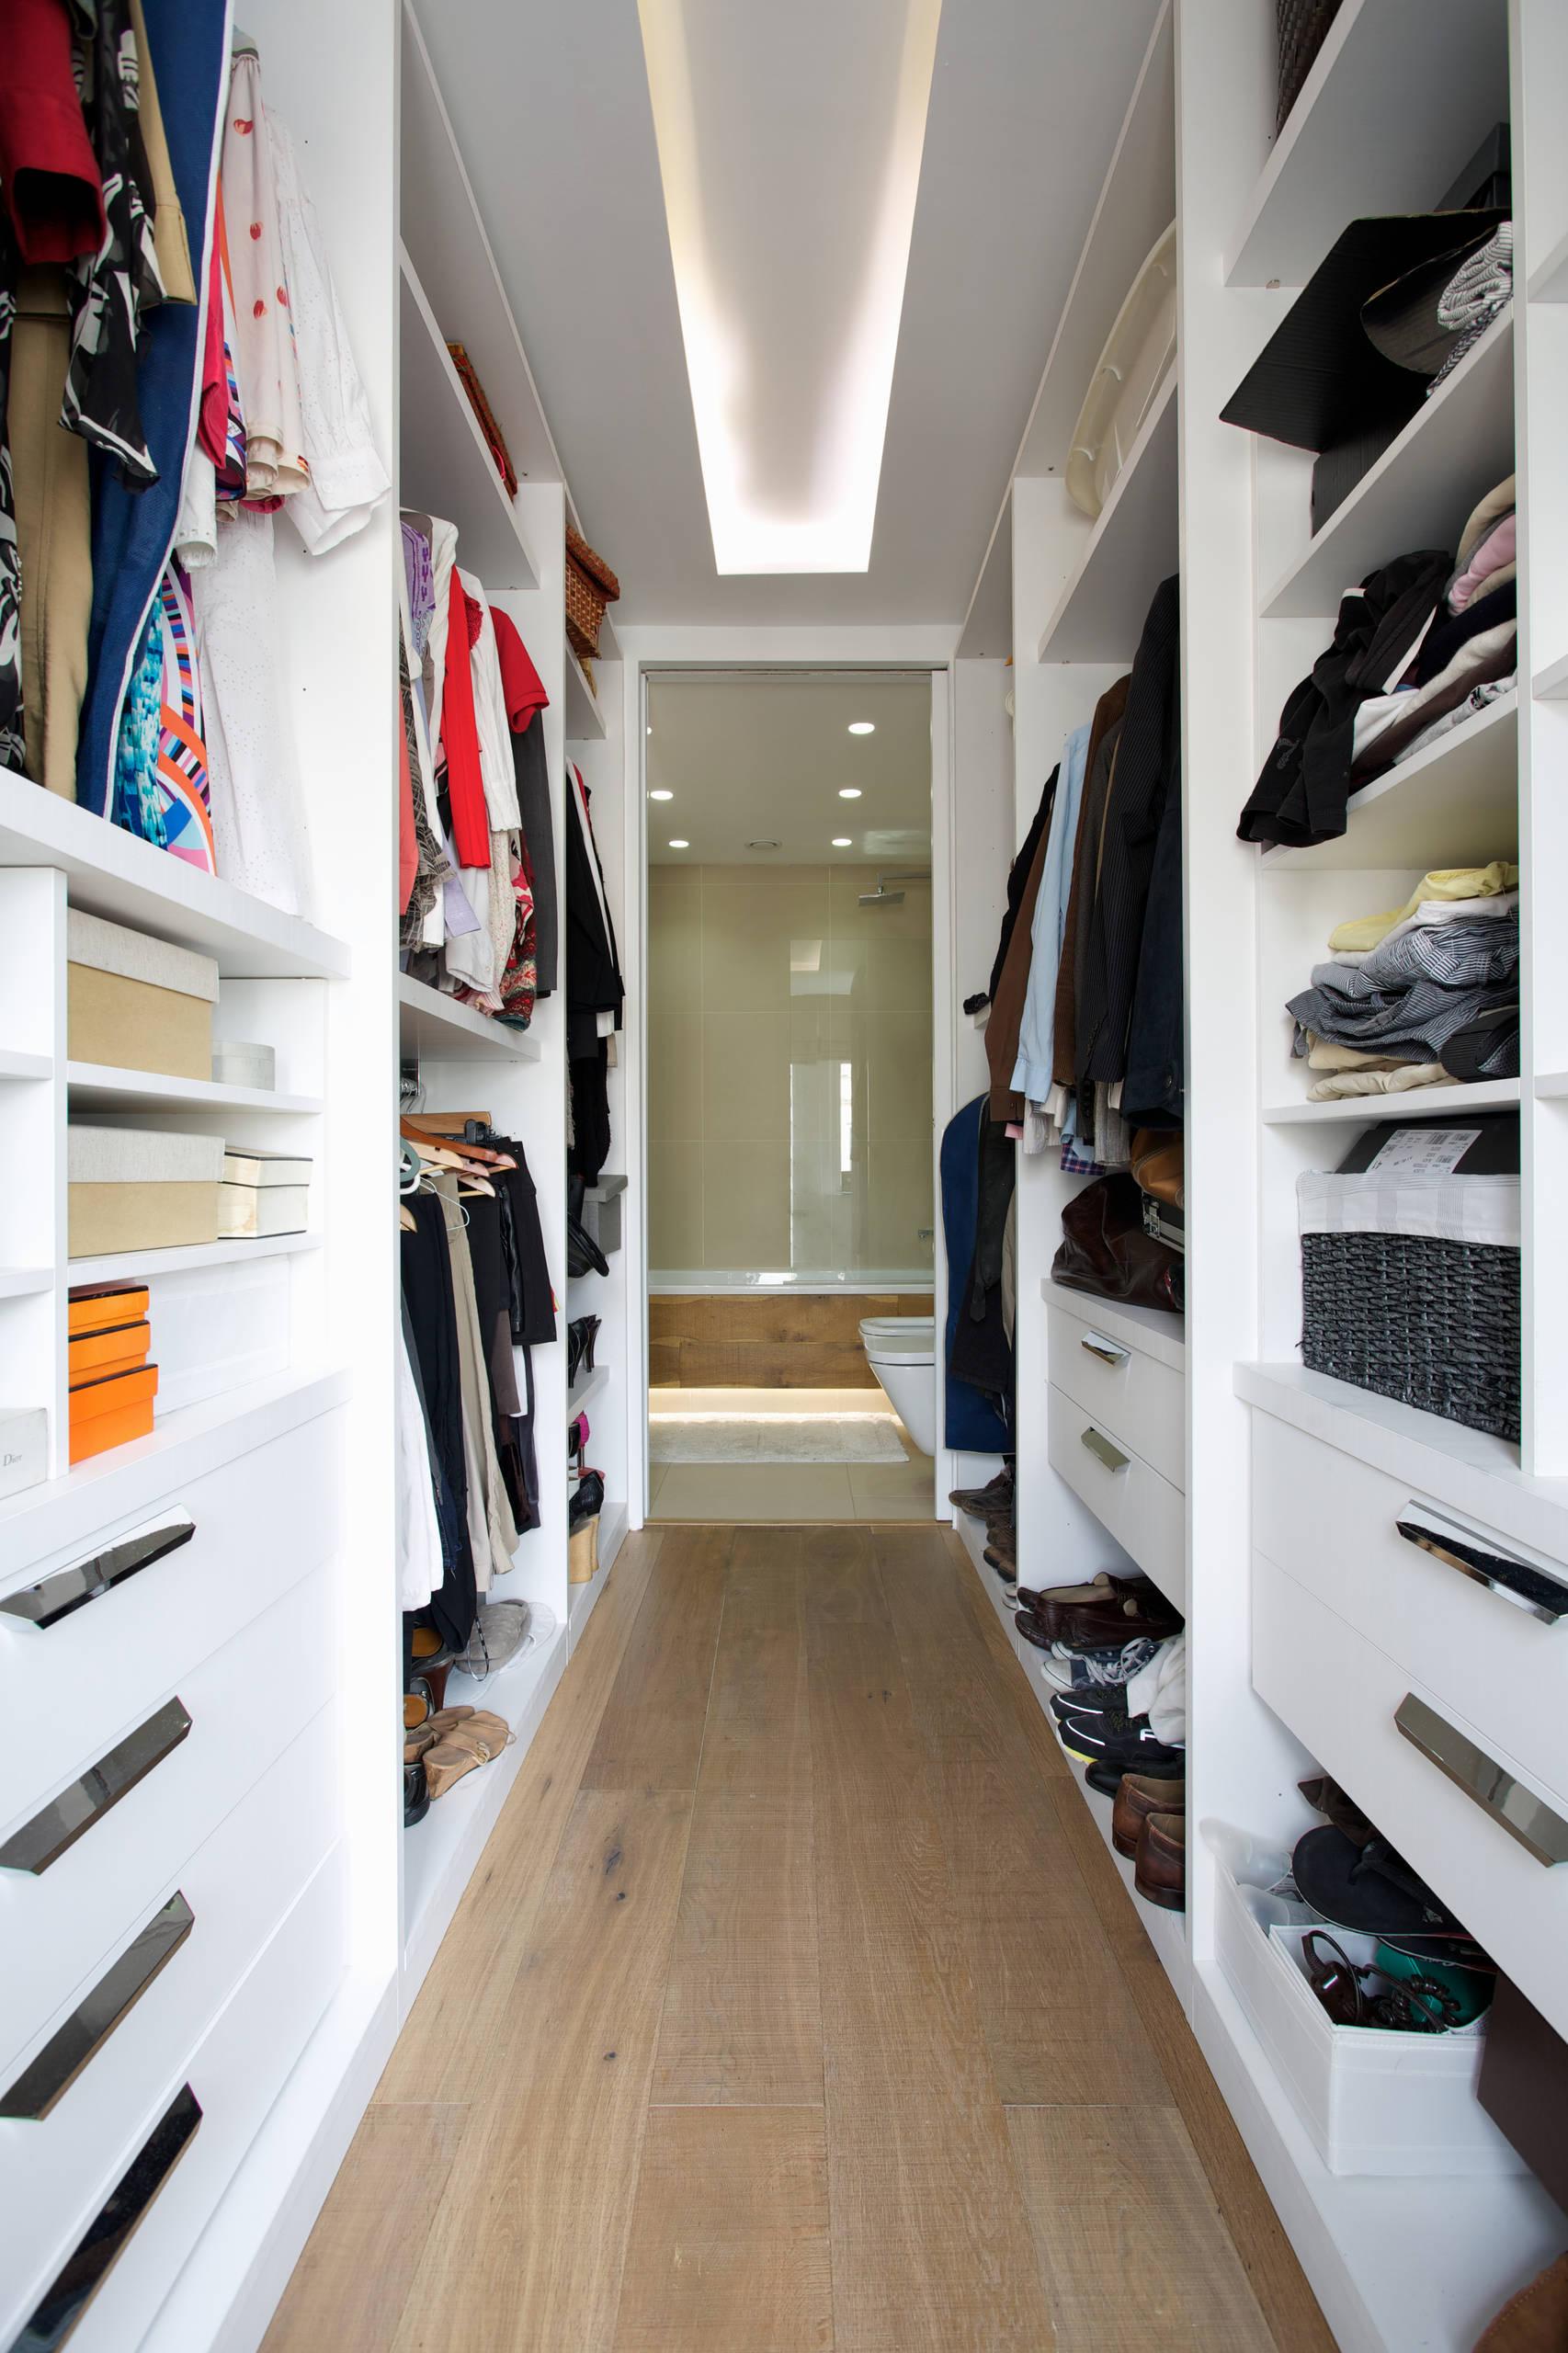 75 Beautiful Walk In Closet Pictures Ideas November 2020 Houzz